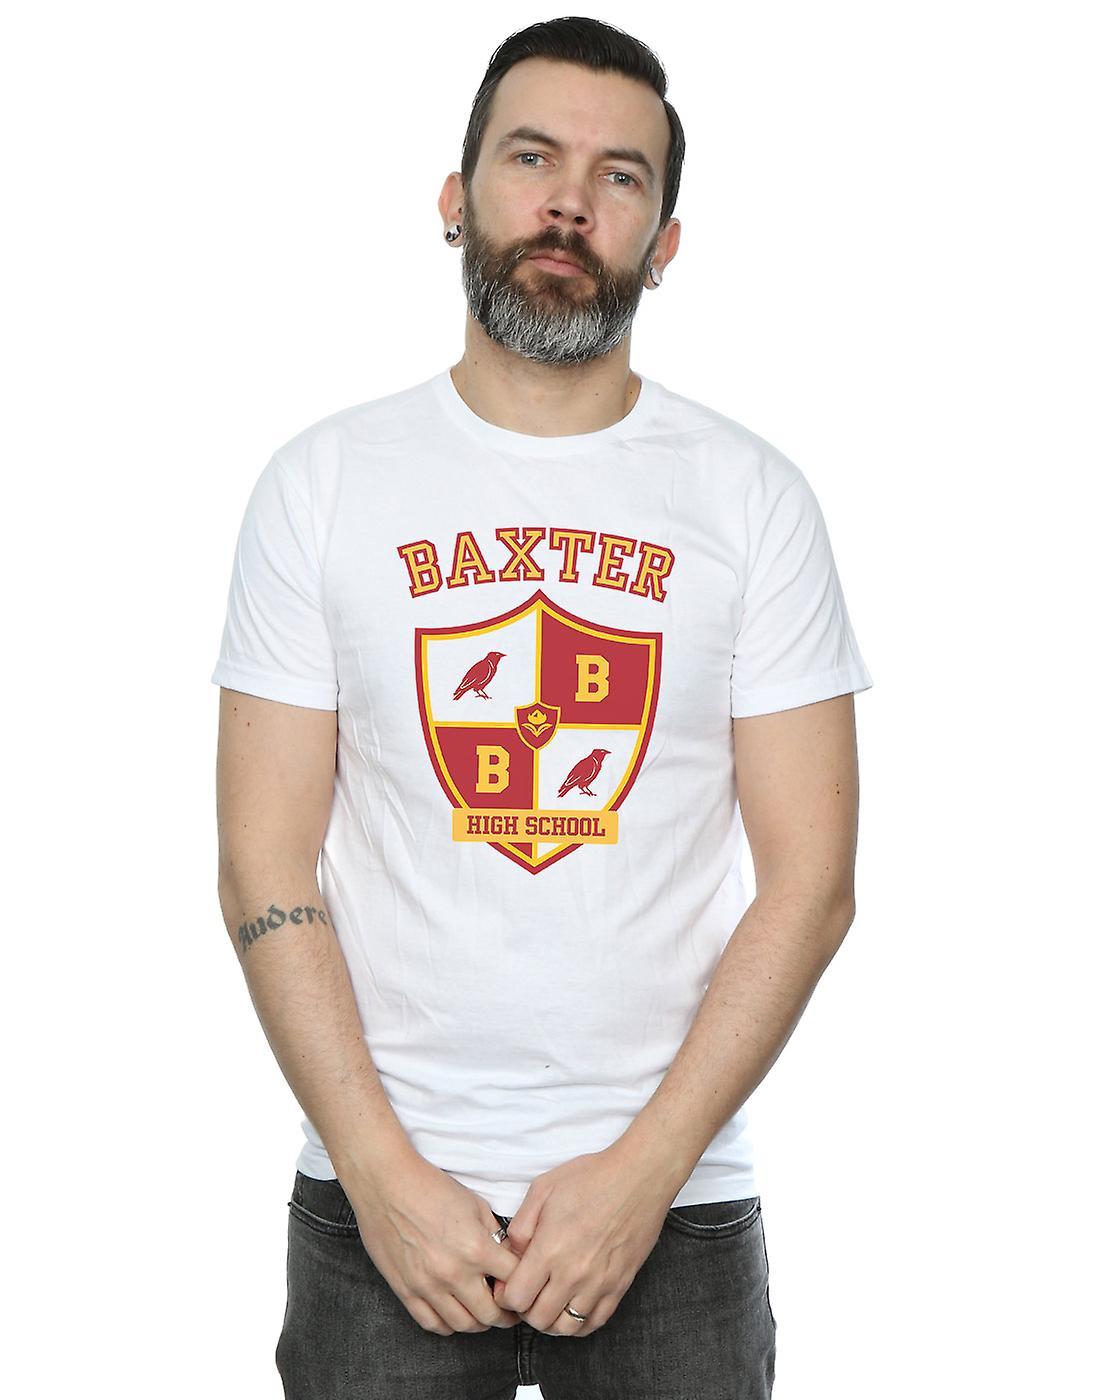 The Chilling Adventures Of Sabrina Men's Baxter Crest T-Shirt